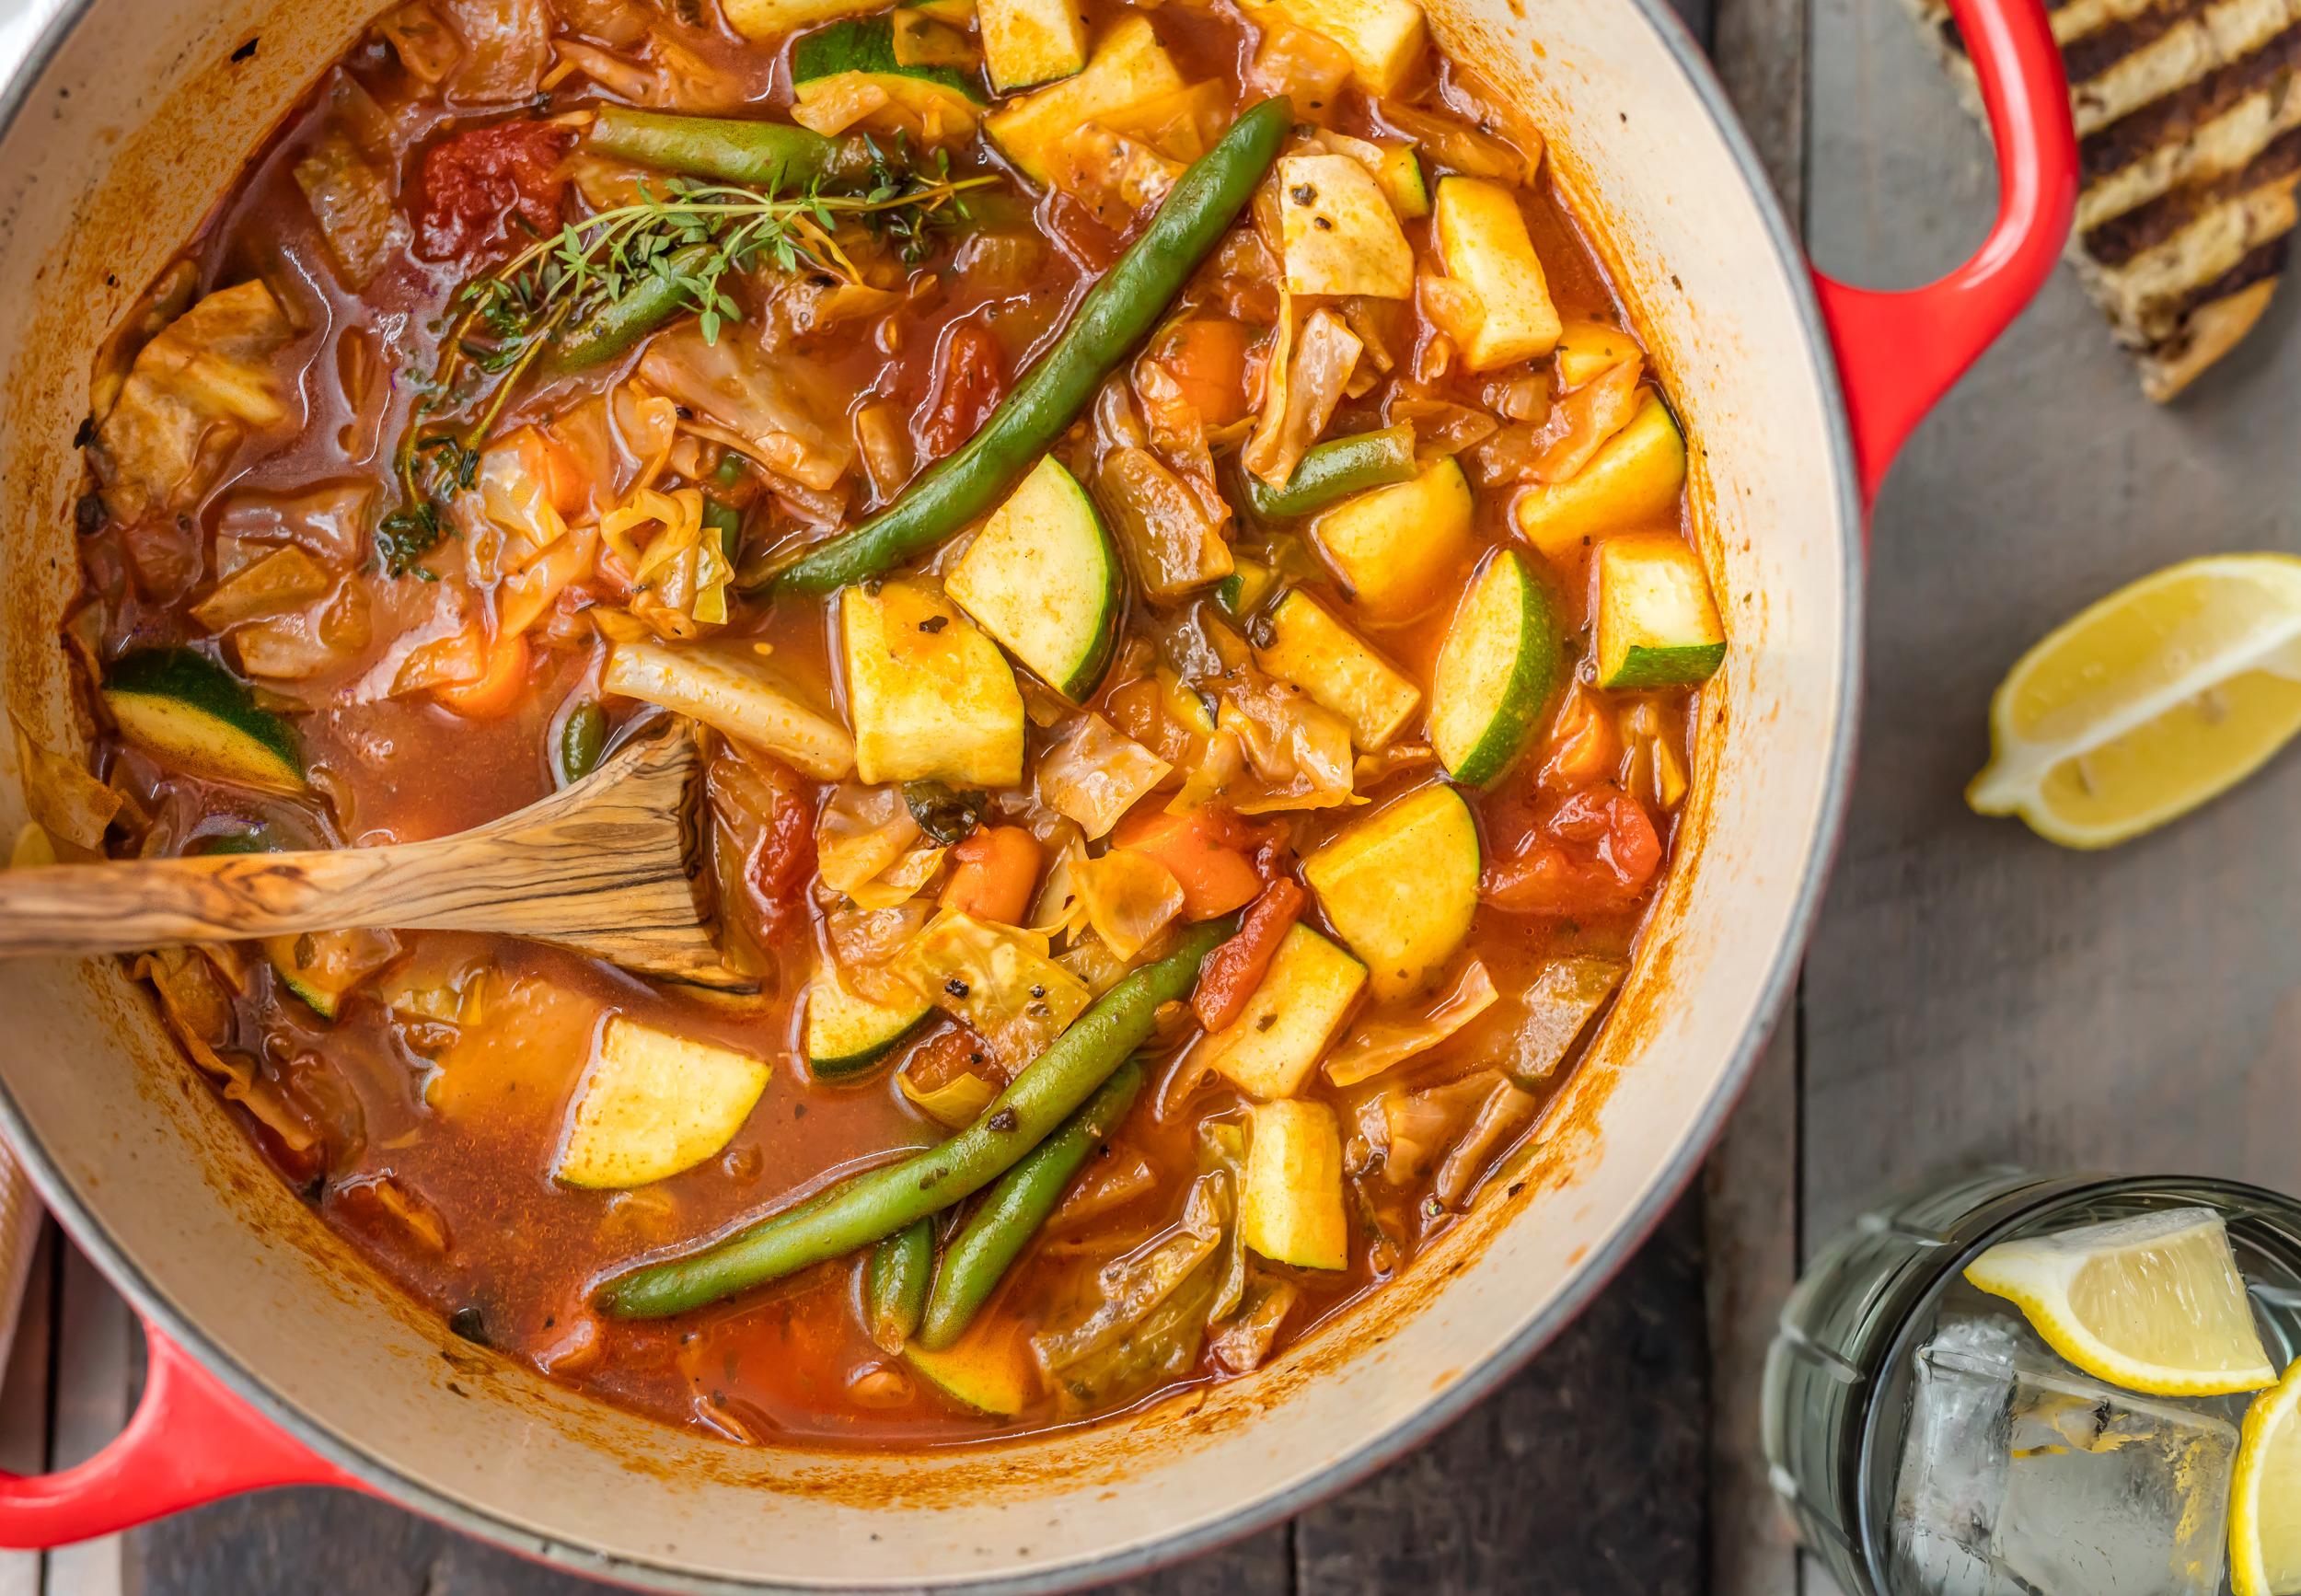 Jerk turkey slow cooker soup from weight watchers recipe - Cuisine weight watchers ...